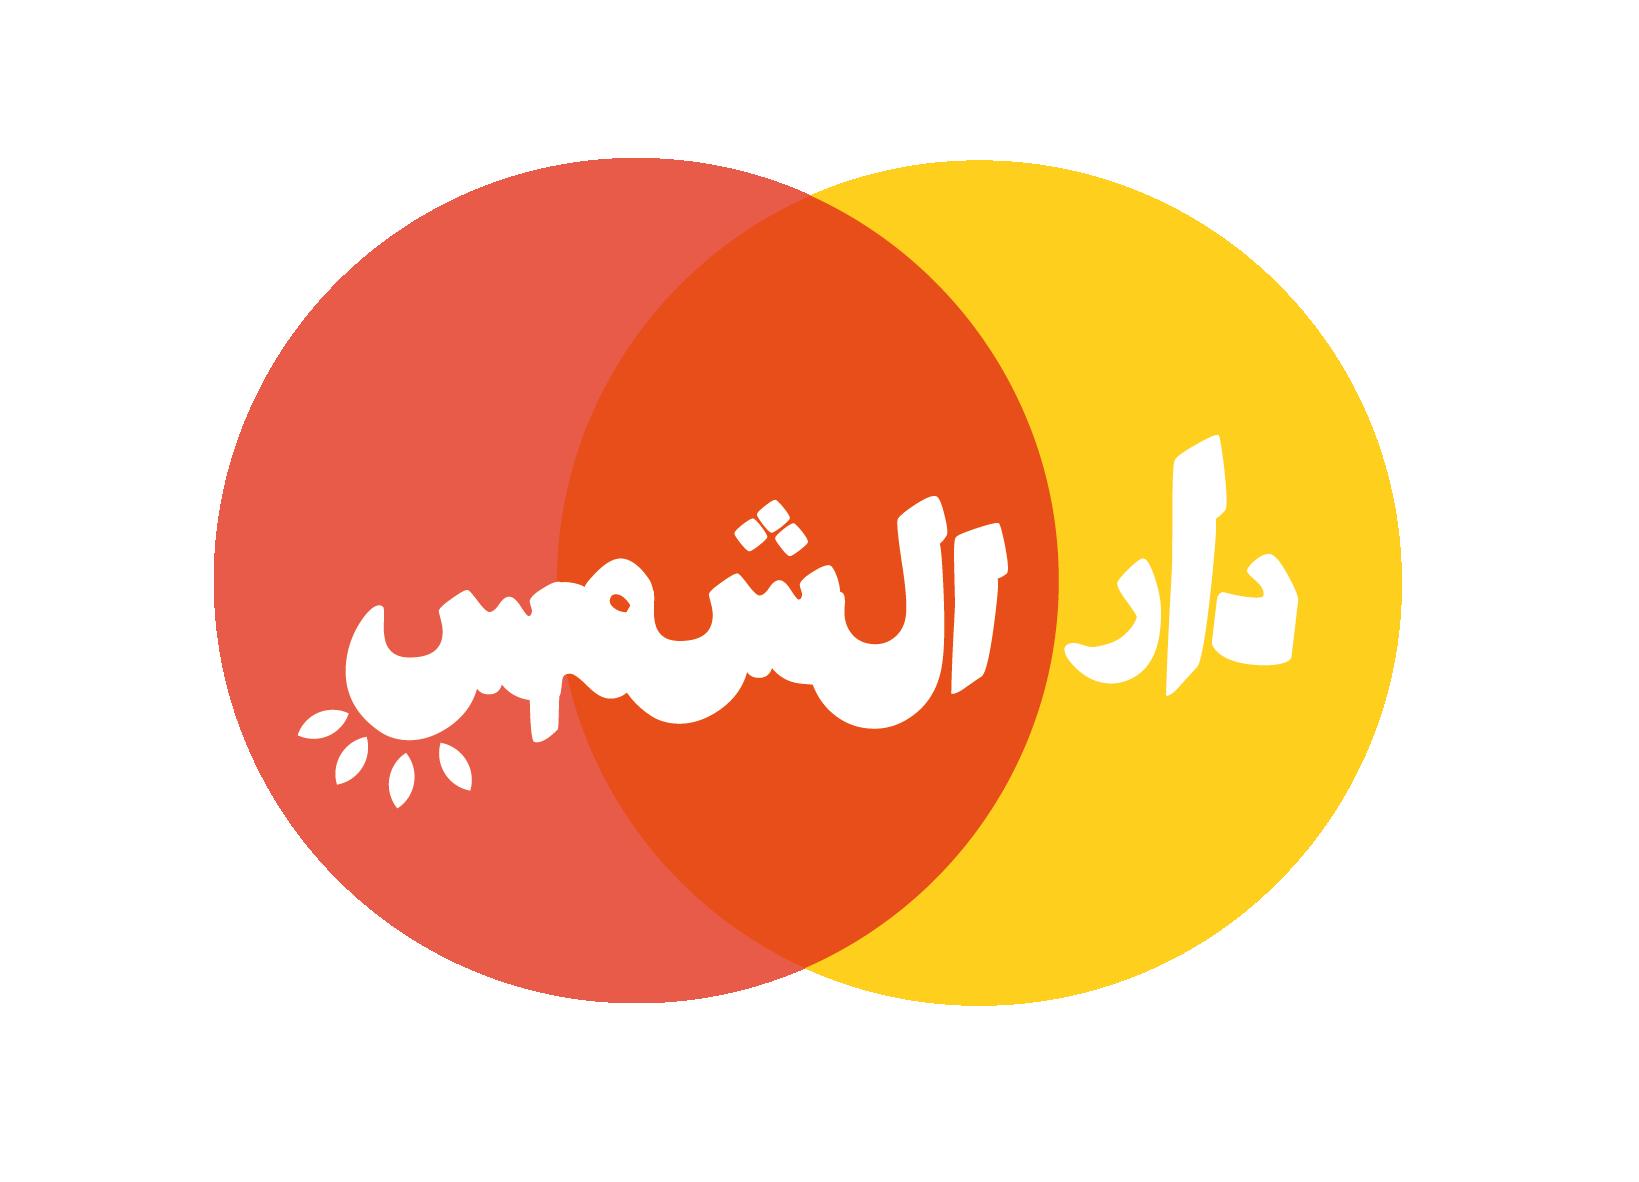 logo_Dar al Shams_final-13.png